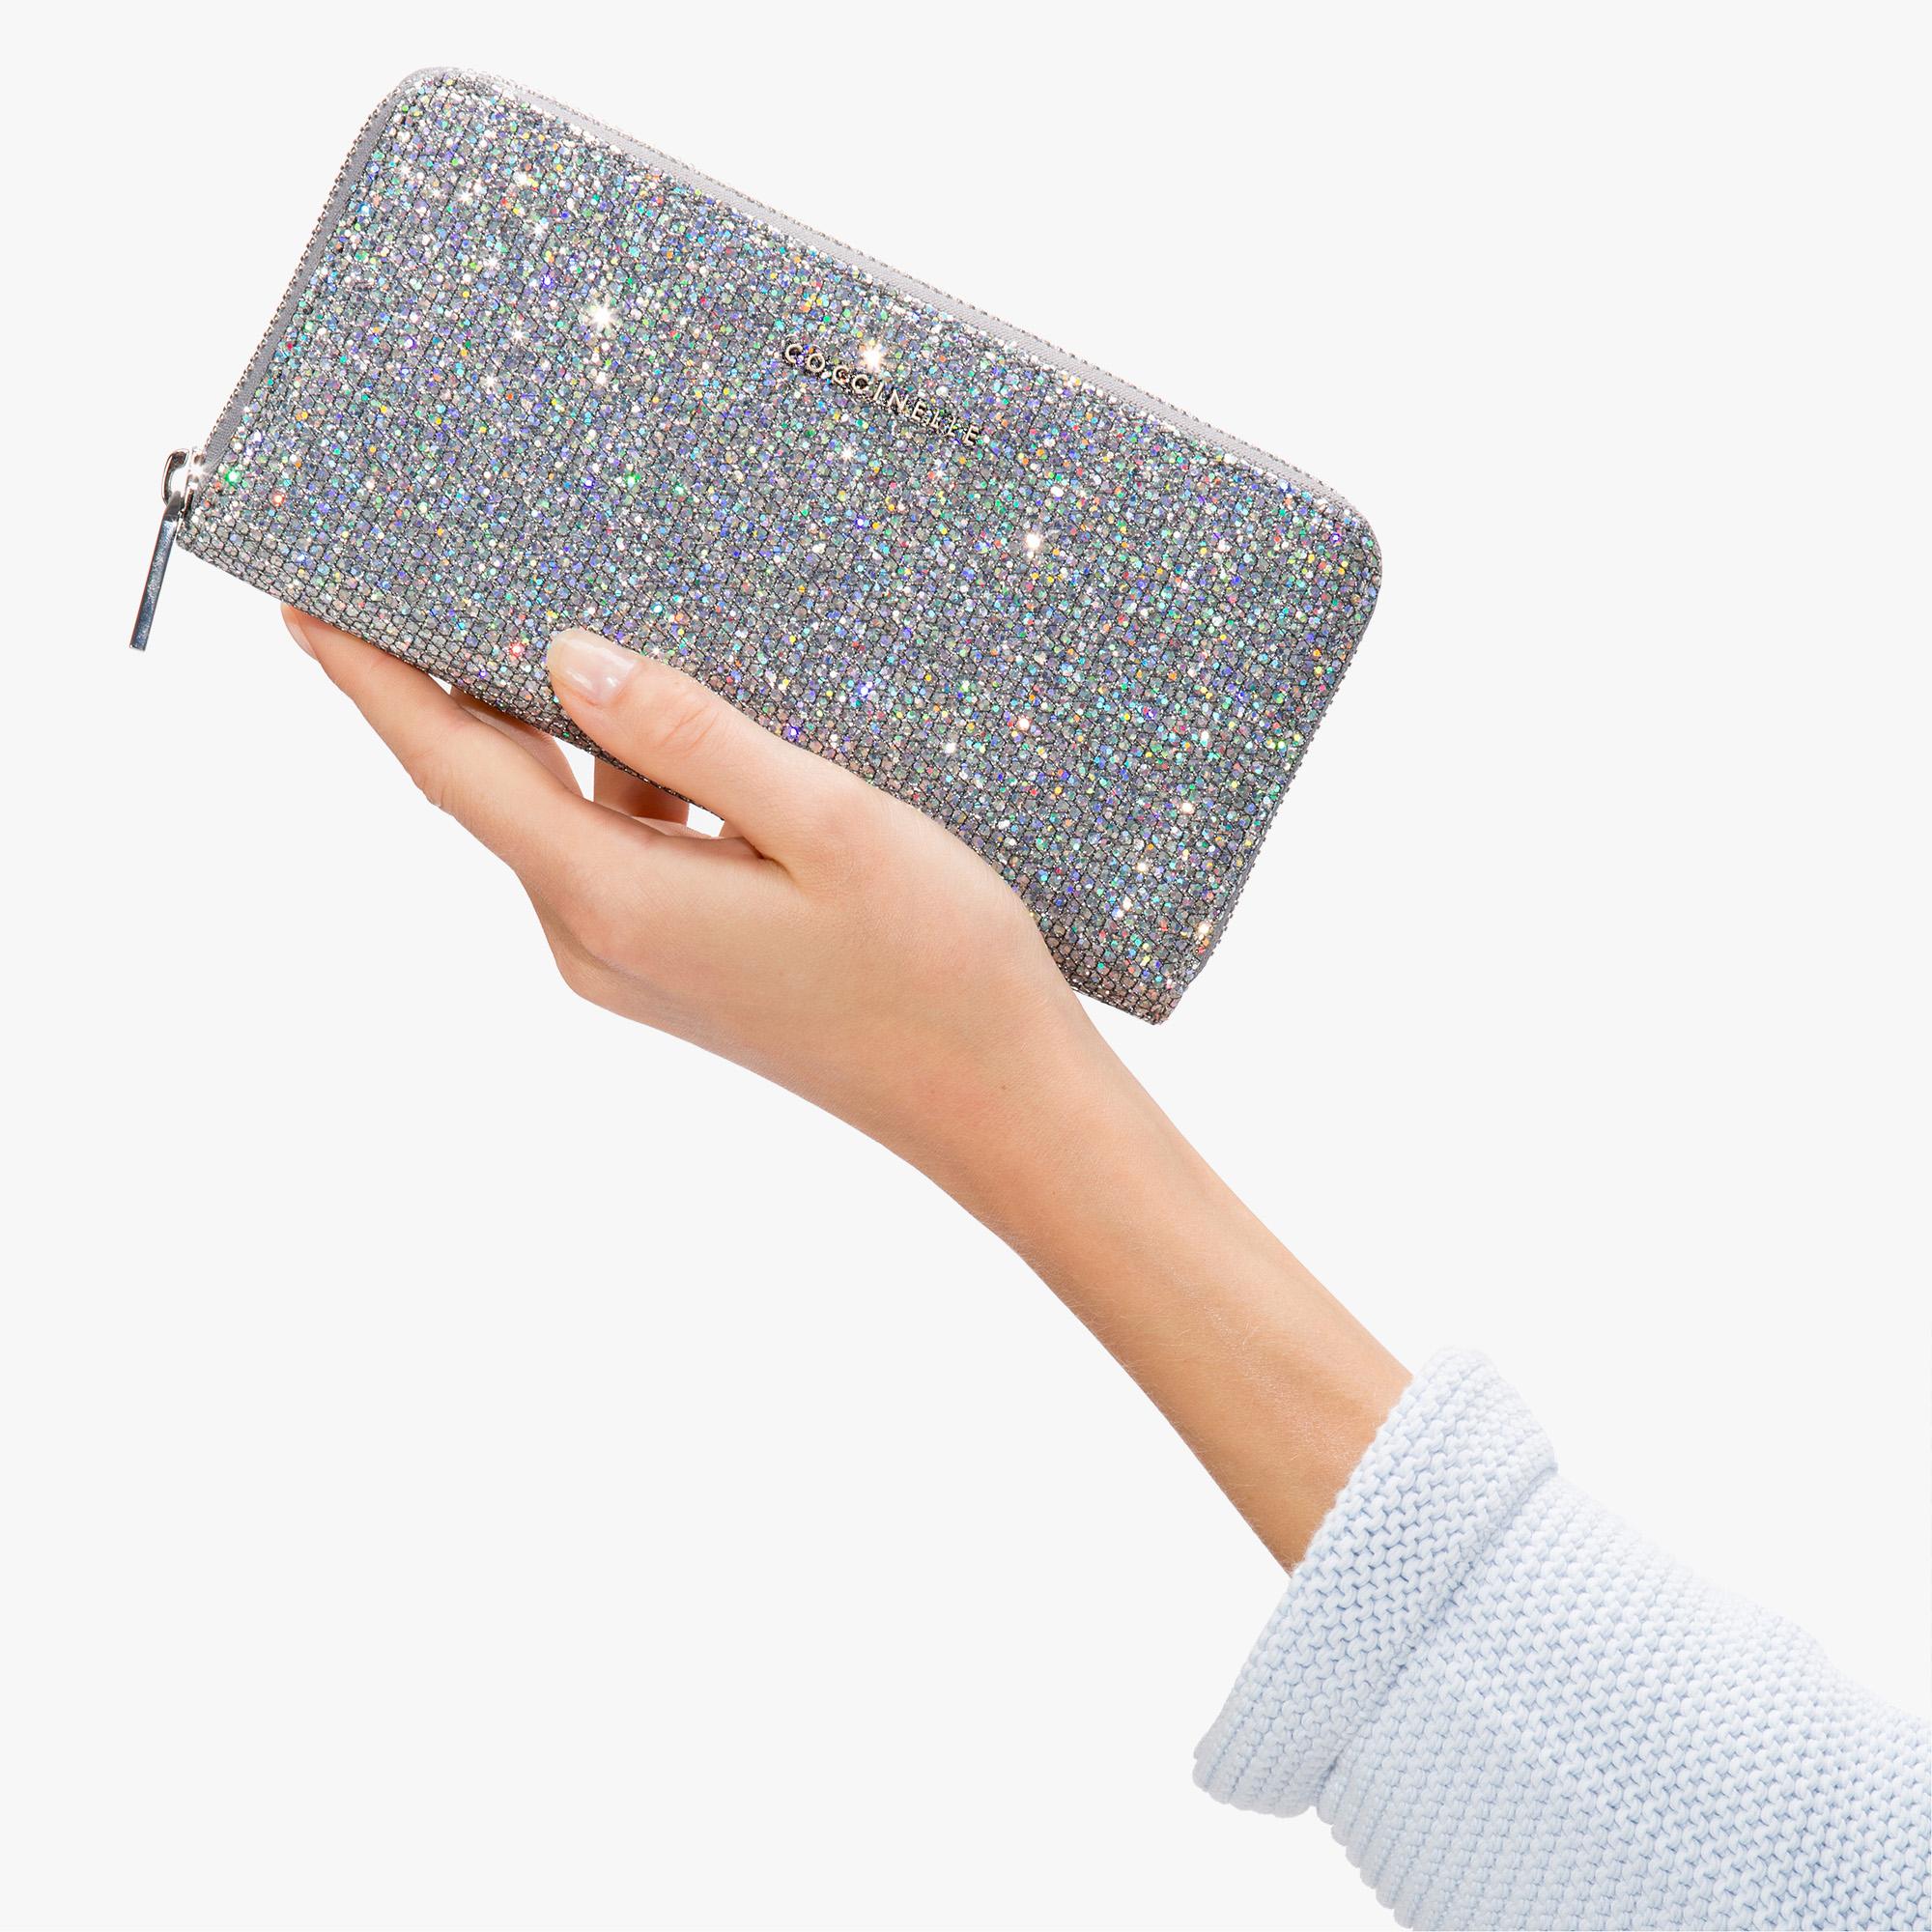 Glittery fabric wallet